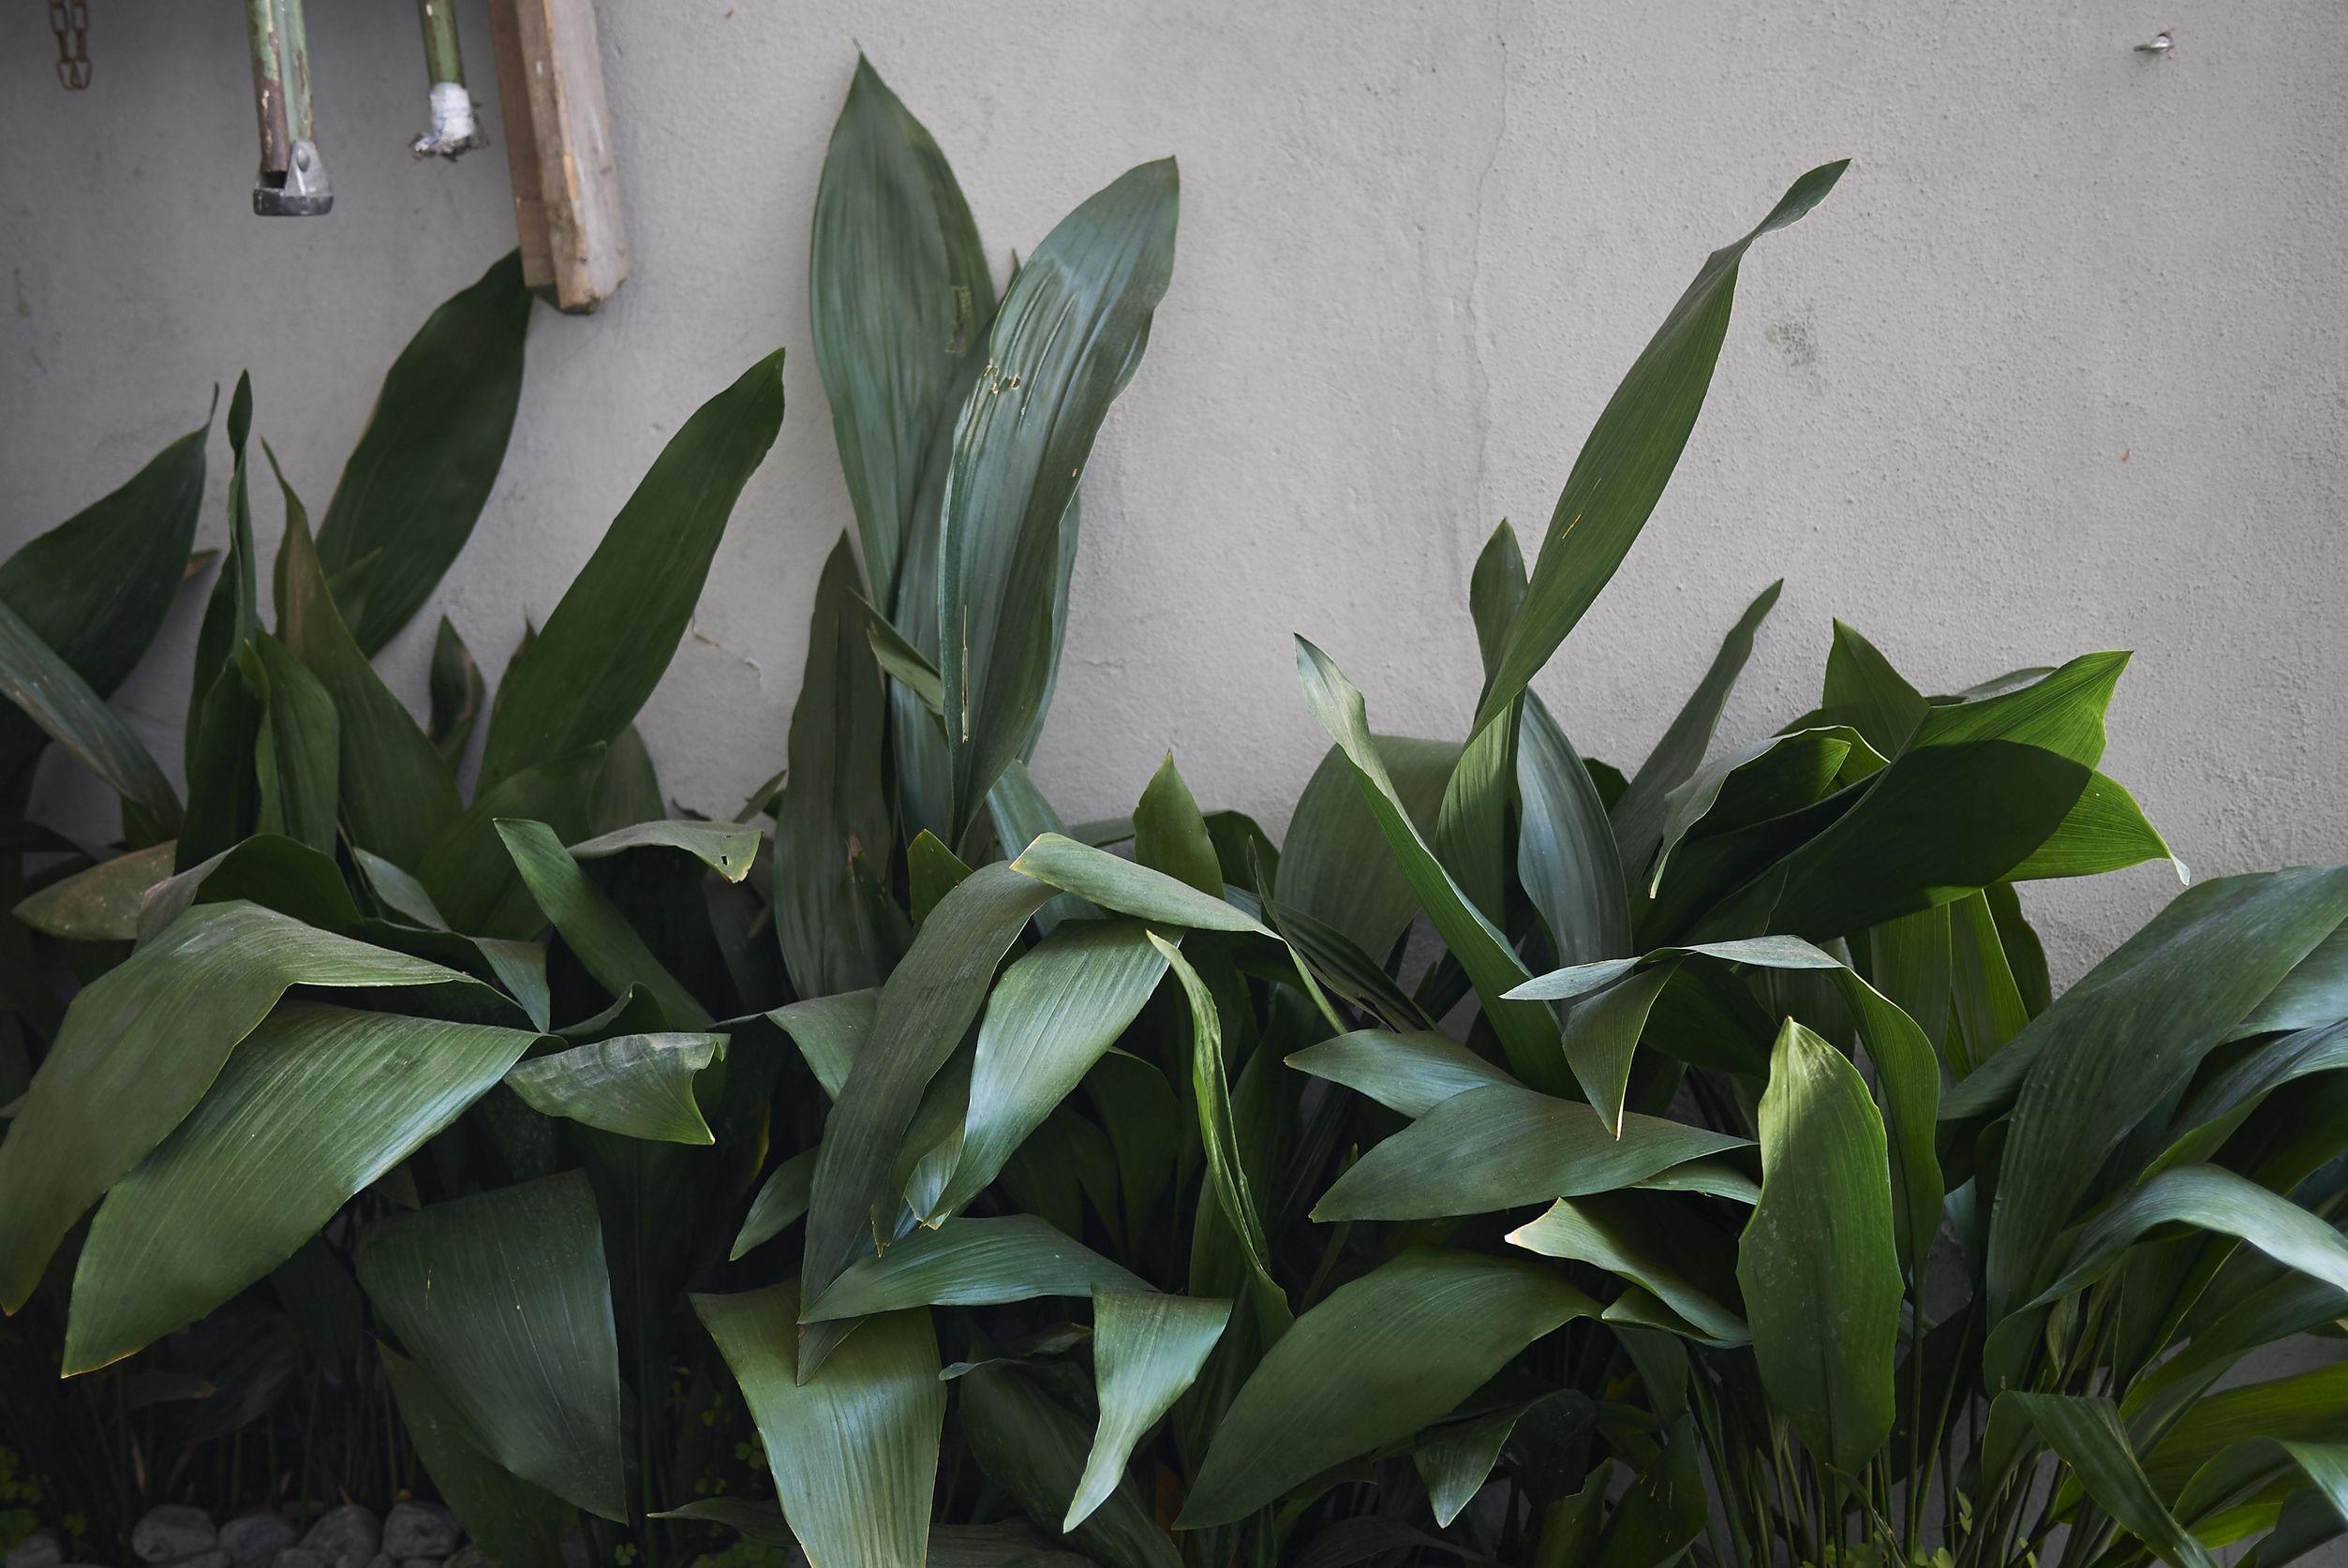 Cast Iron Plant (Aspidistra Elatior) thrives best with little to no sunlight.